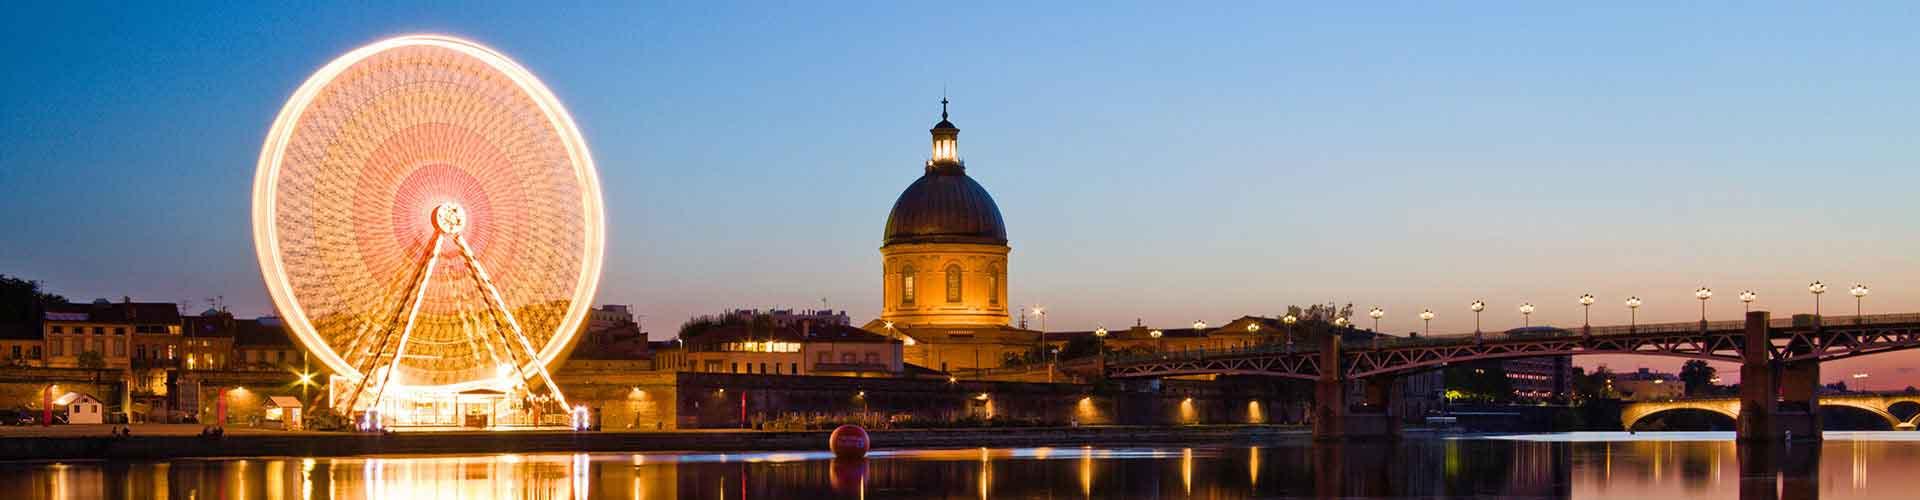 Toulouse – Hostels in Toulouse. Toulouse auf der Karte. Fotos und Bewertungen für jedes Hostel in Toulouse.